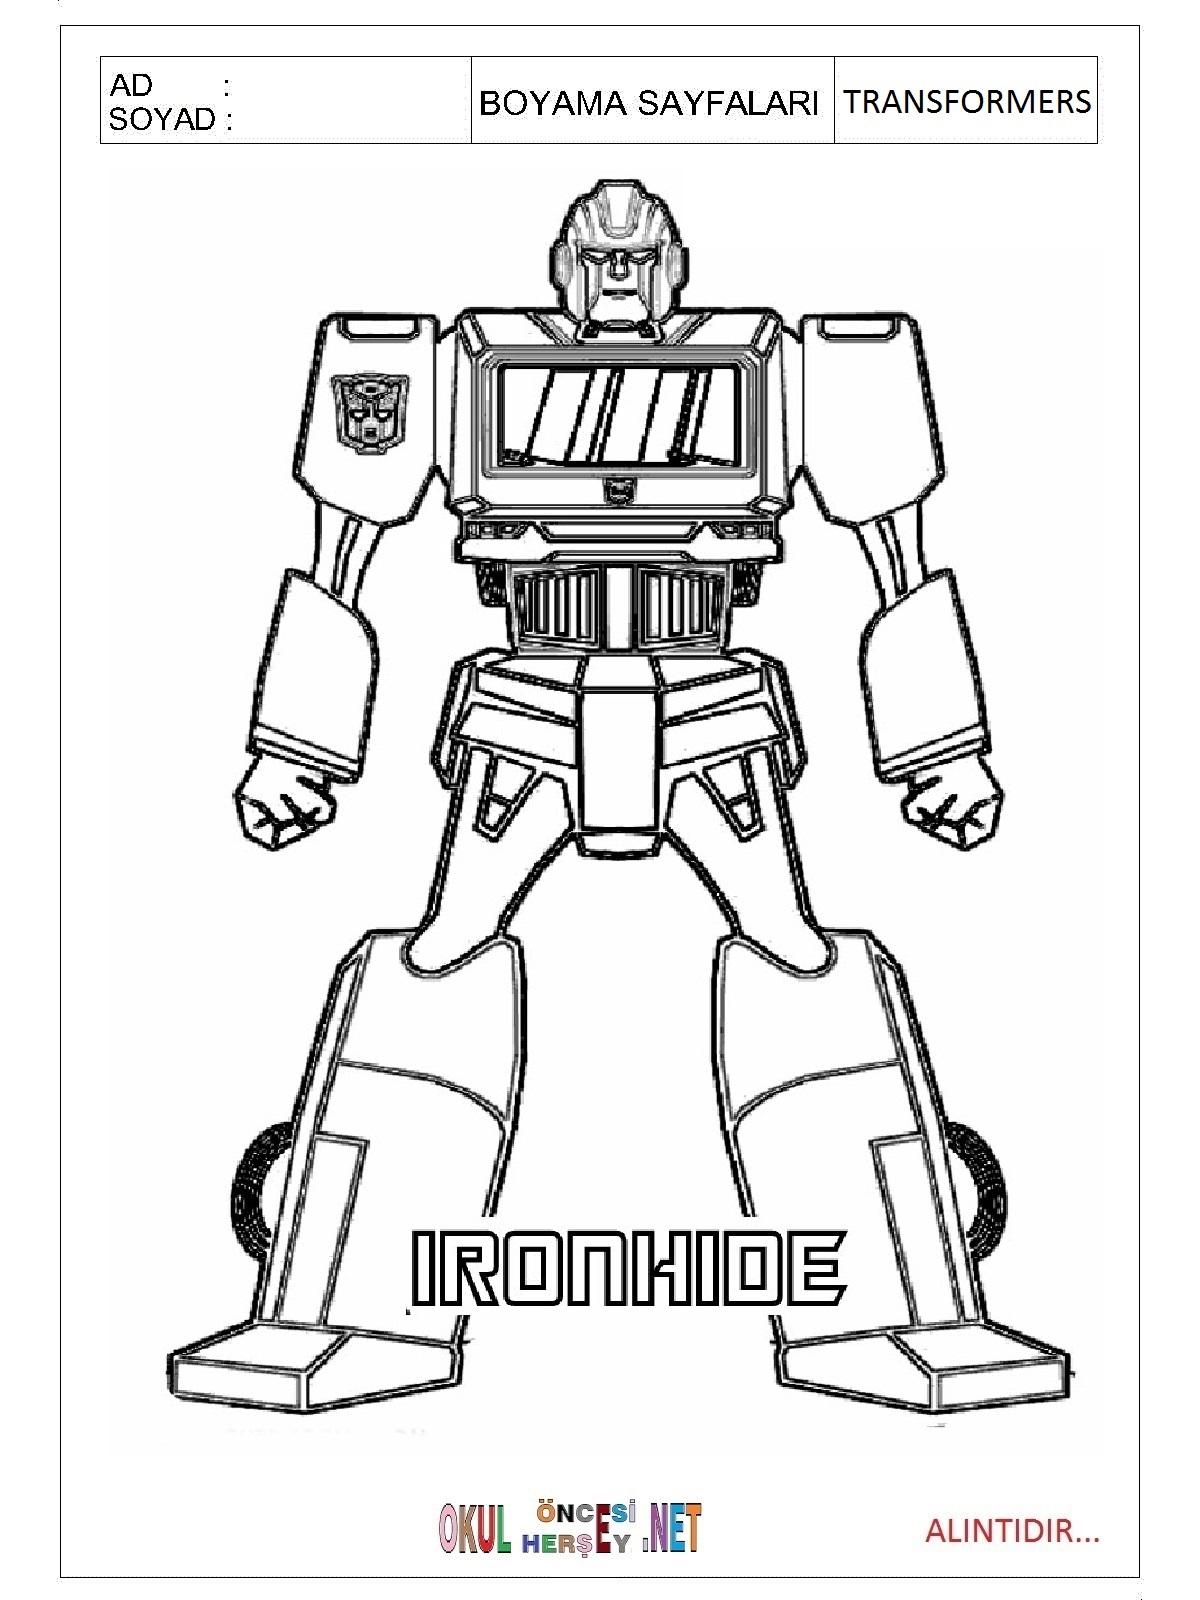 Robot Boyamas